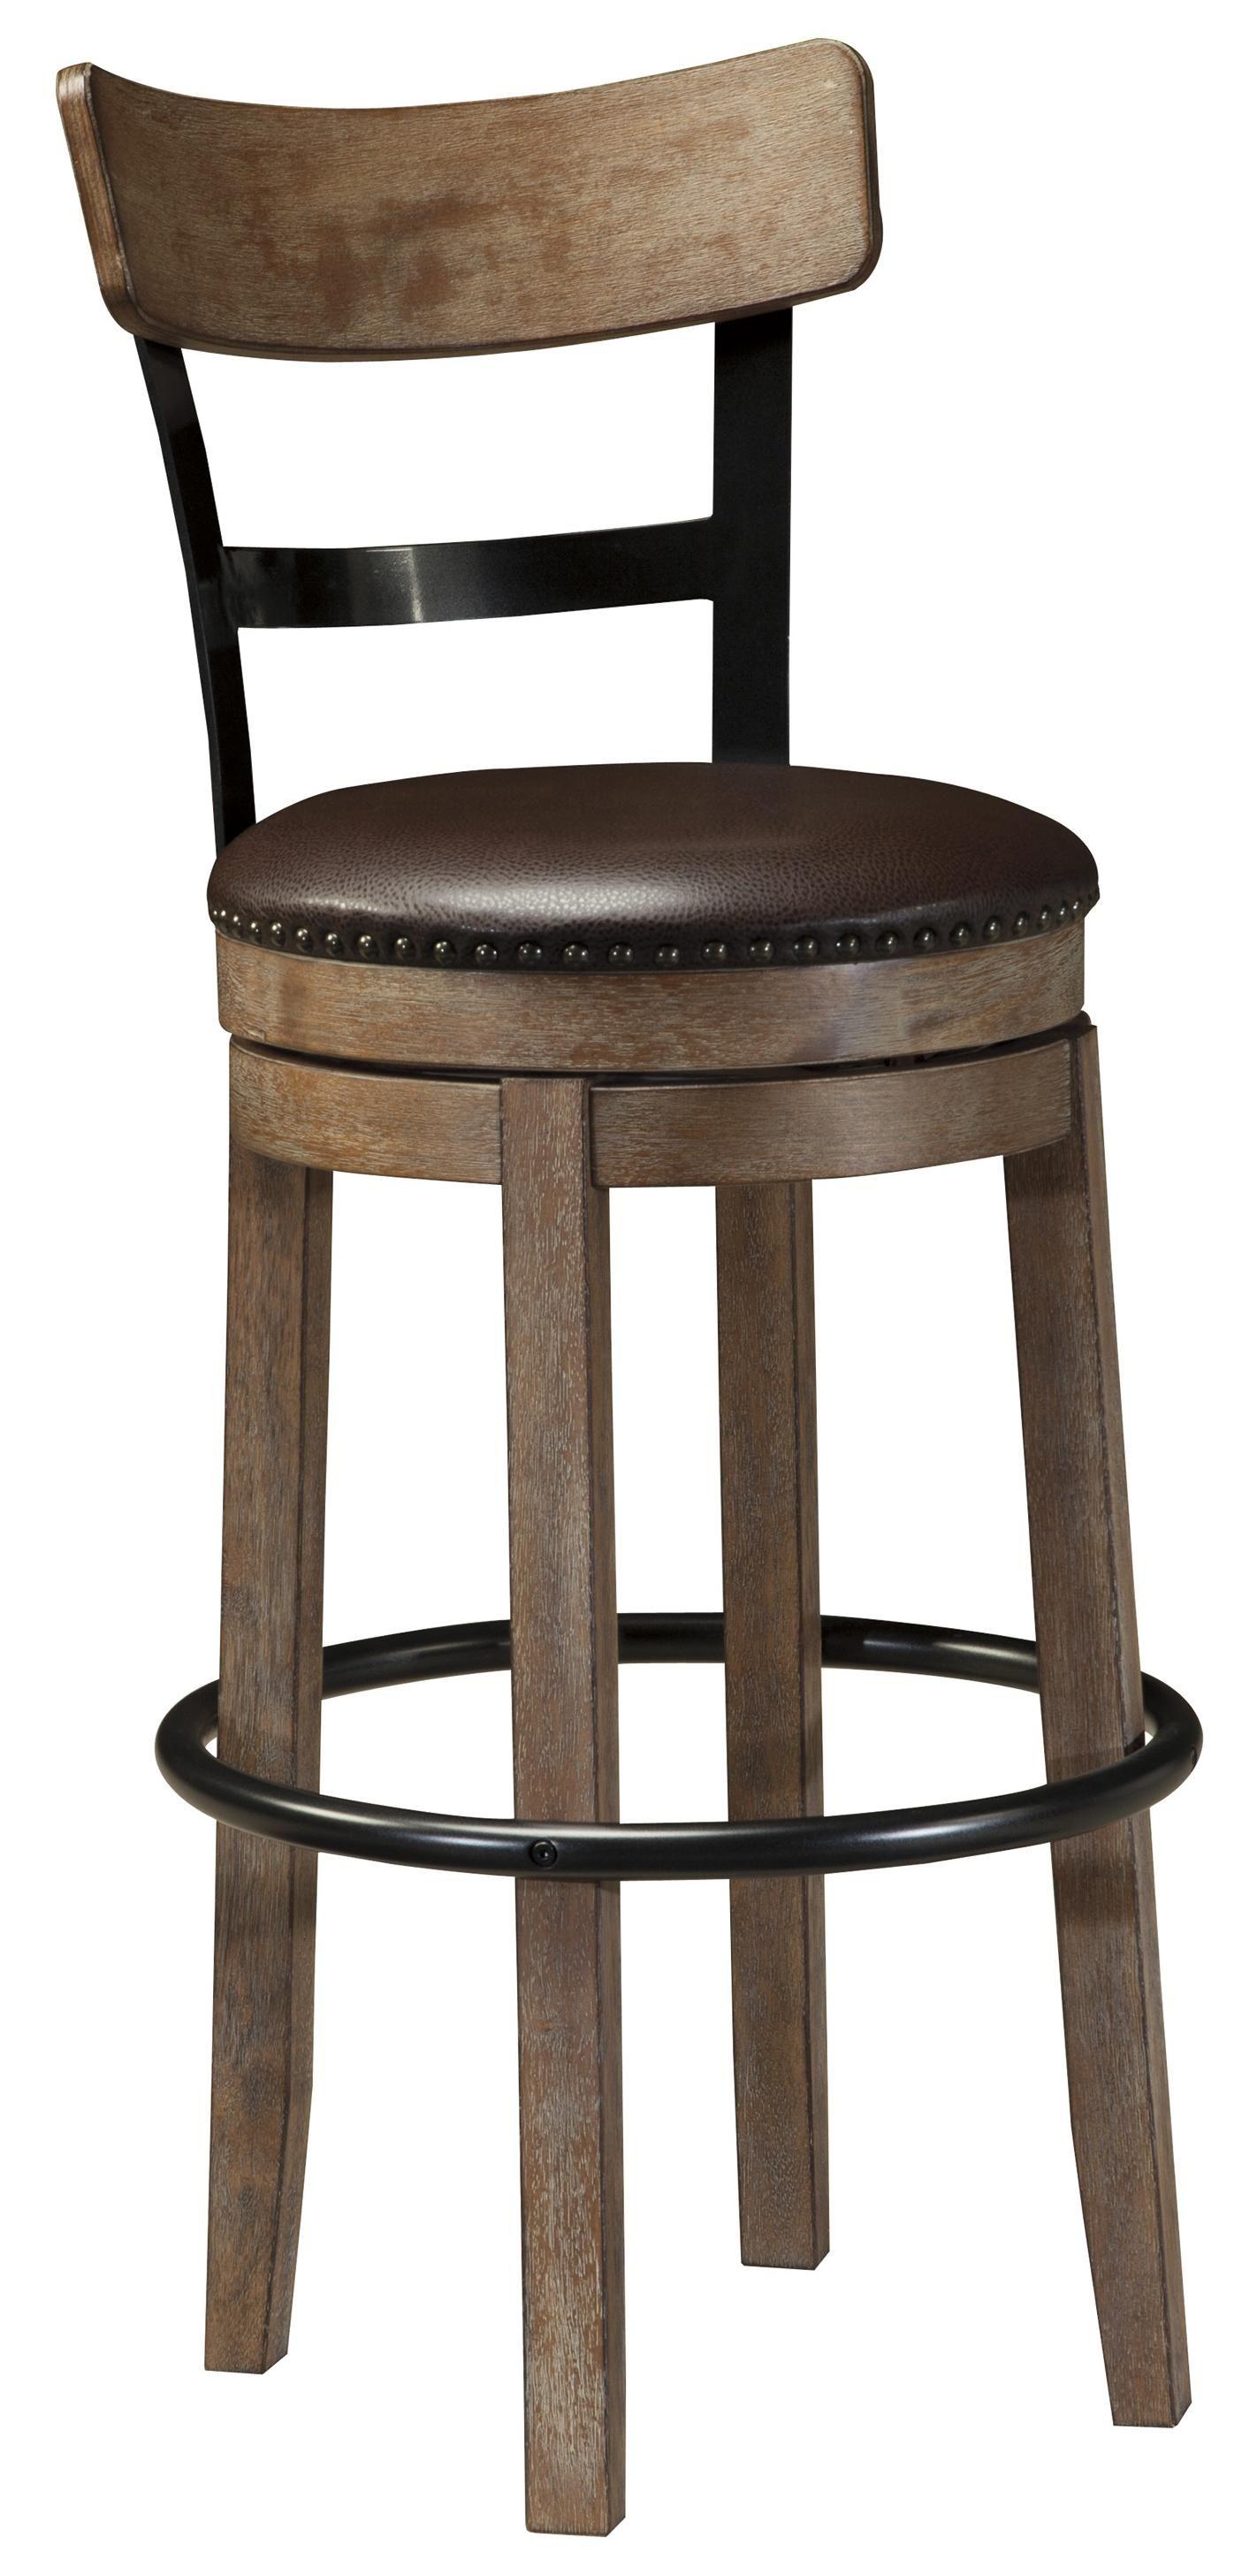 Pinnadel Tall Upholstered Swivel Barstool With Wood Metal